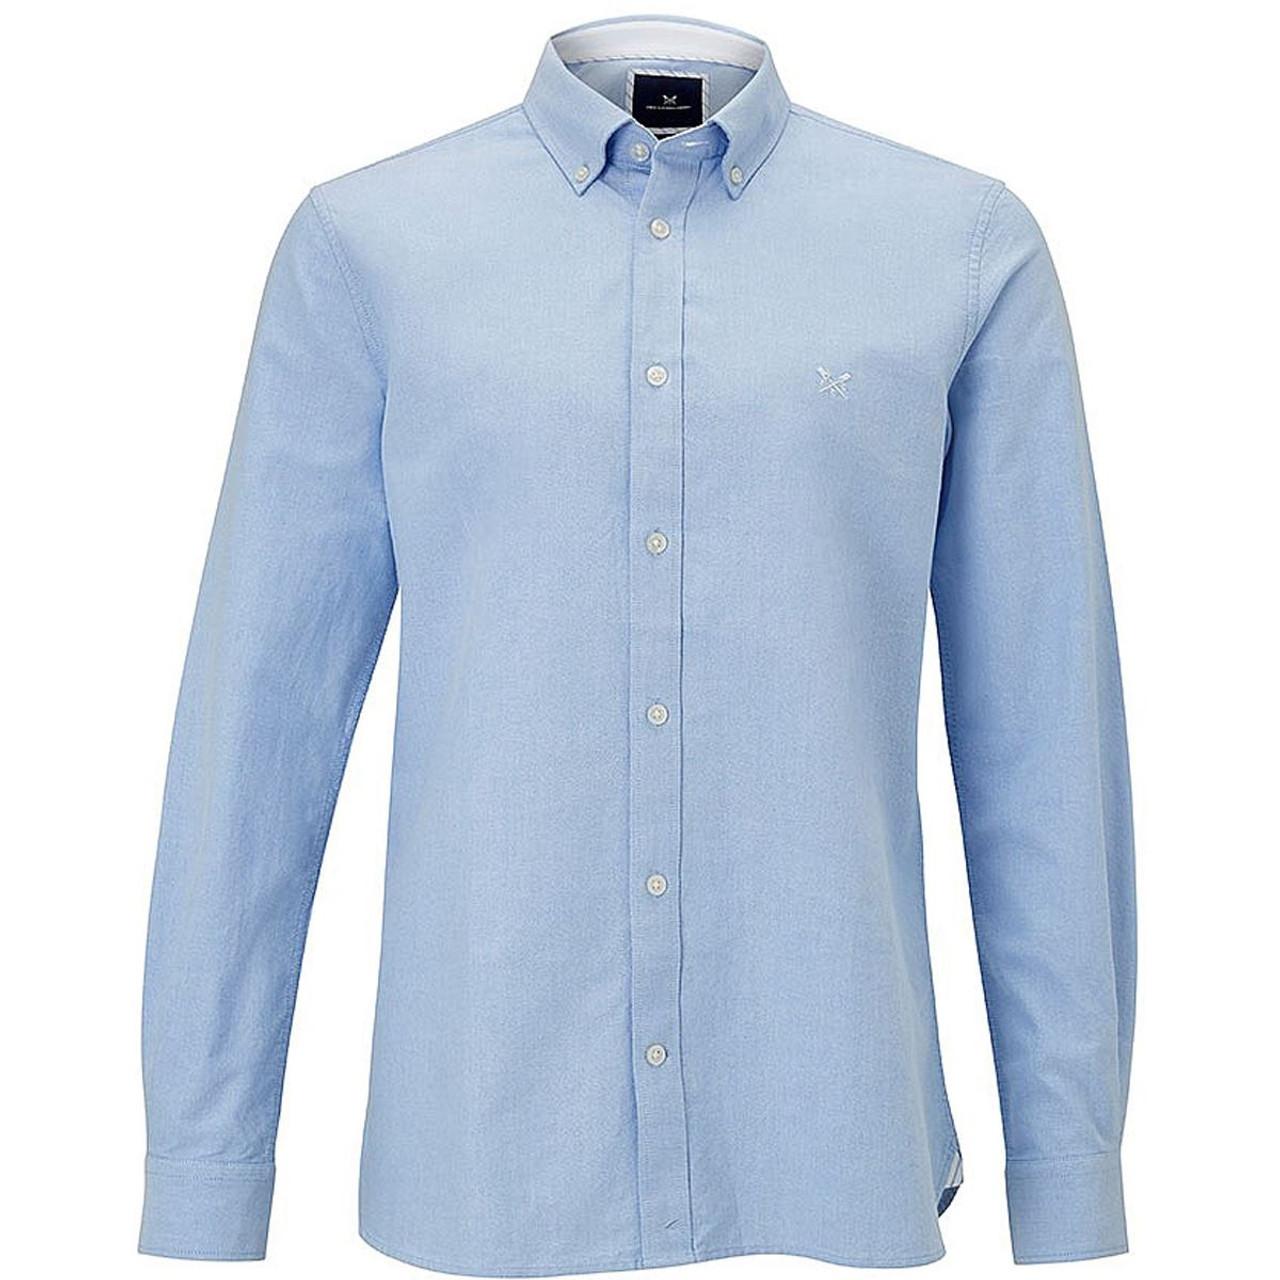 Crew Clothing Slim Oxford Shirt